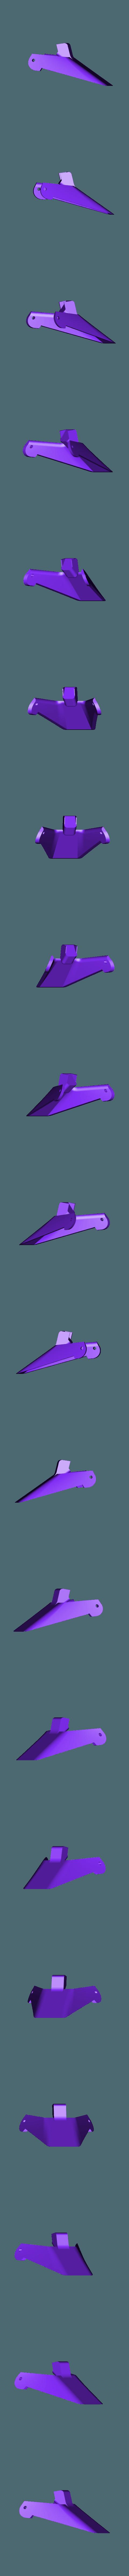 Pièce 5.STL Download STL file Translocator Sombra • 3D print model, Midnight_05